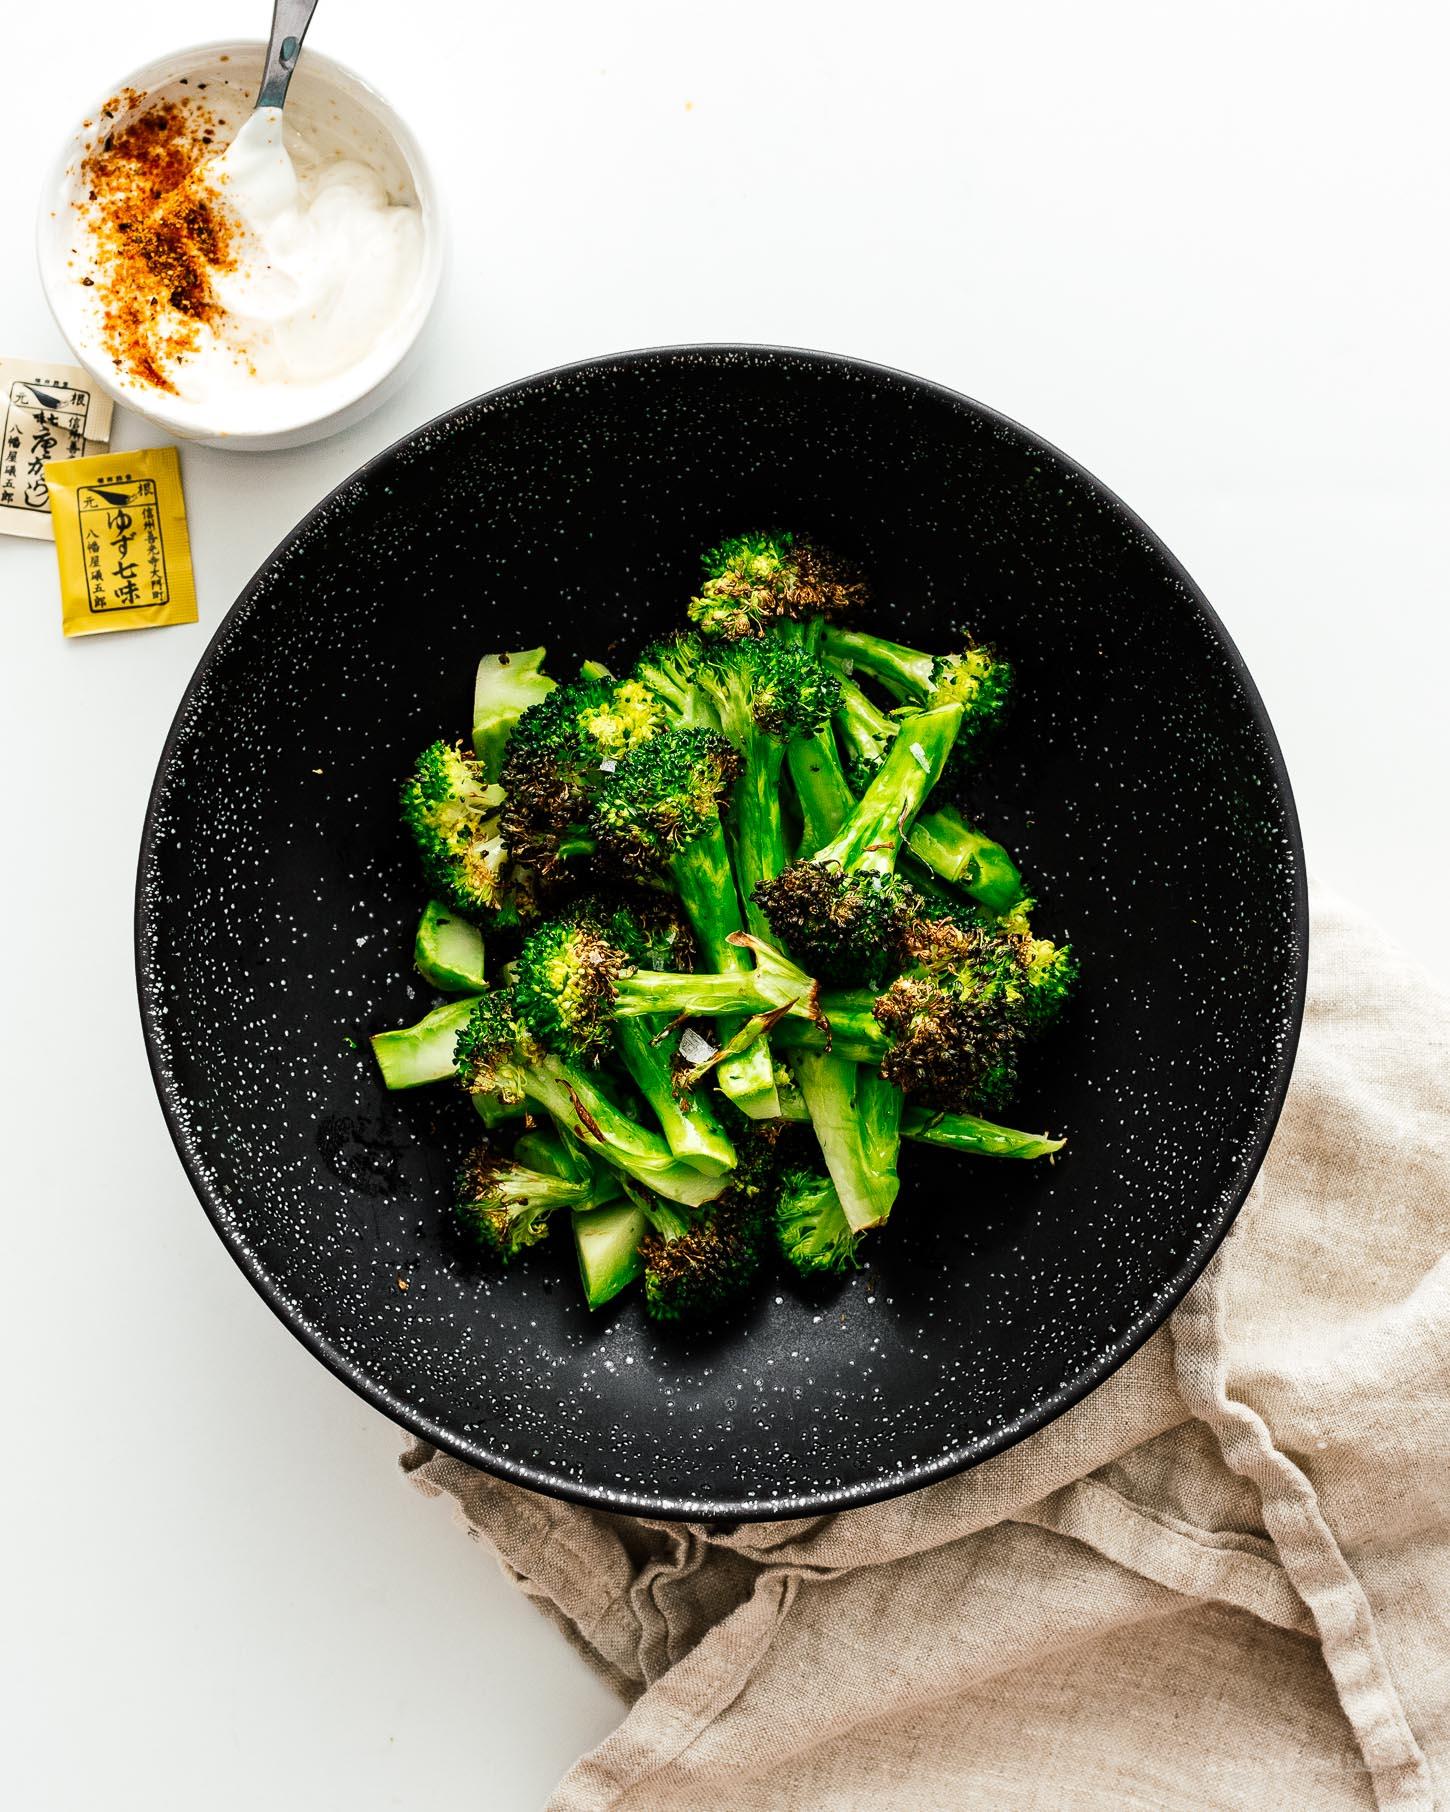 How to Make Crispy Air-Fryer Roasted Broccoli | www.iamafoodblog.com